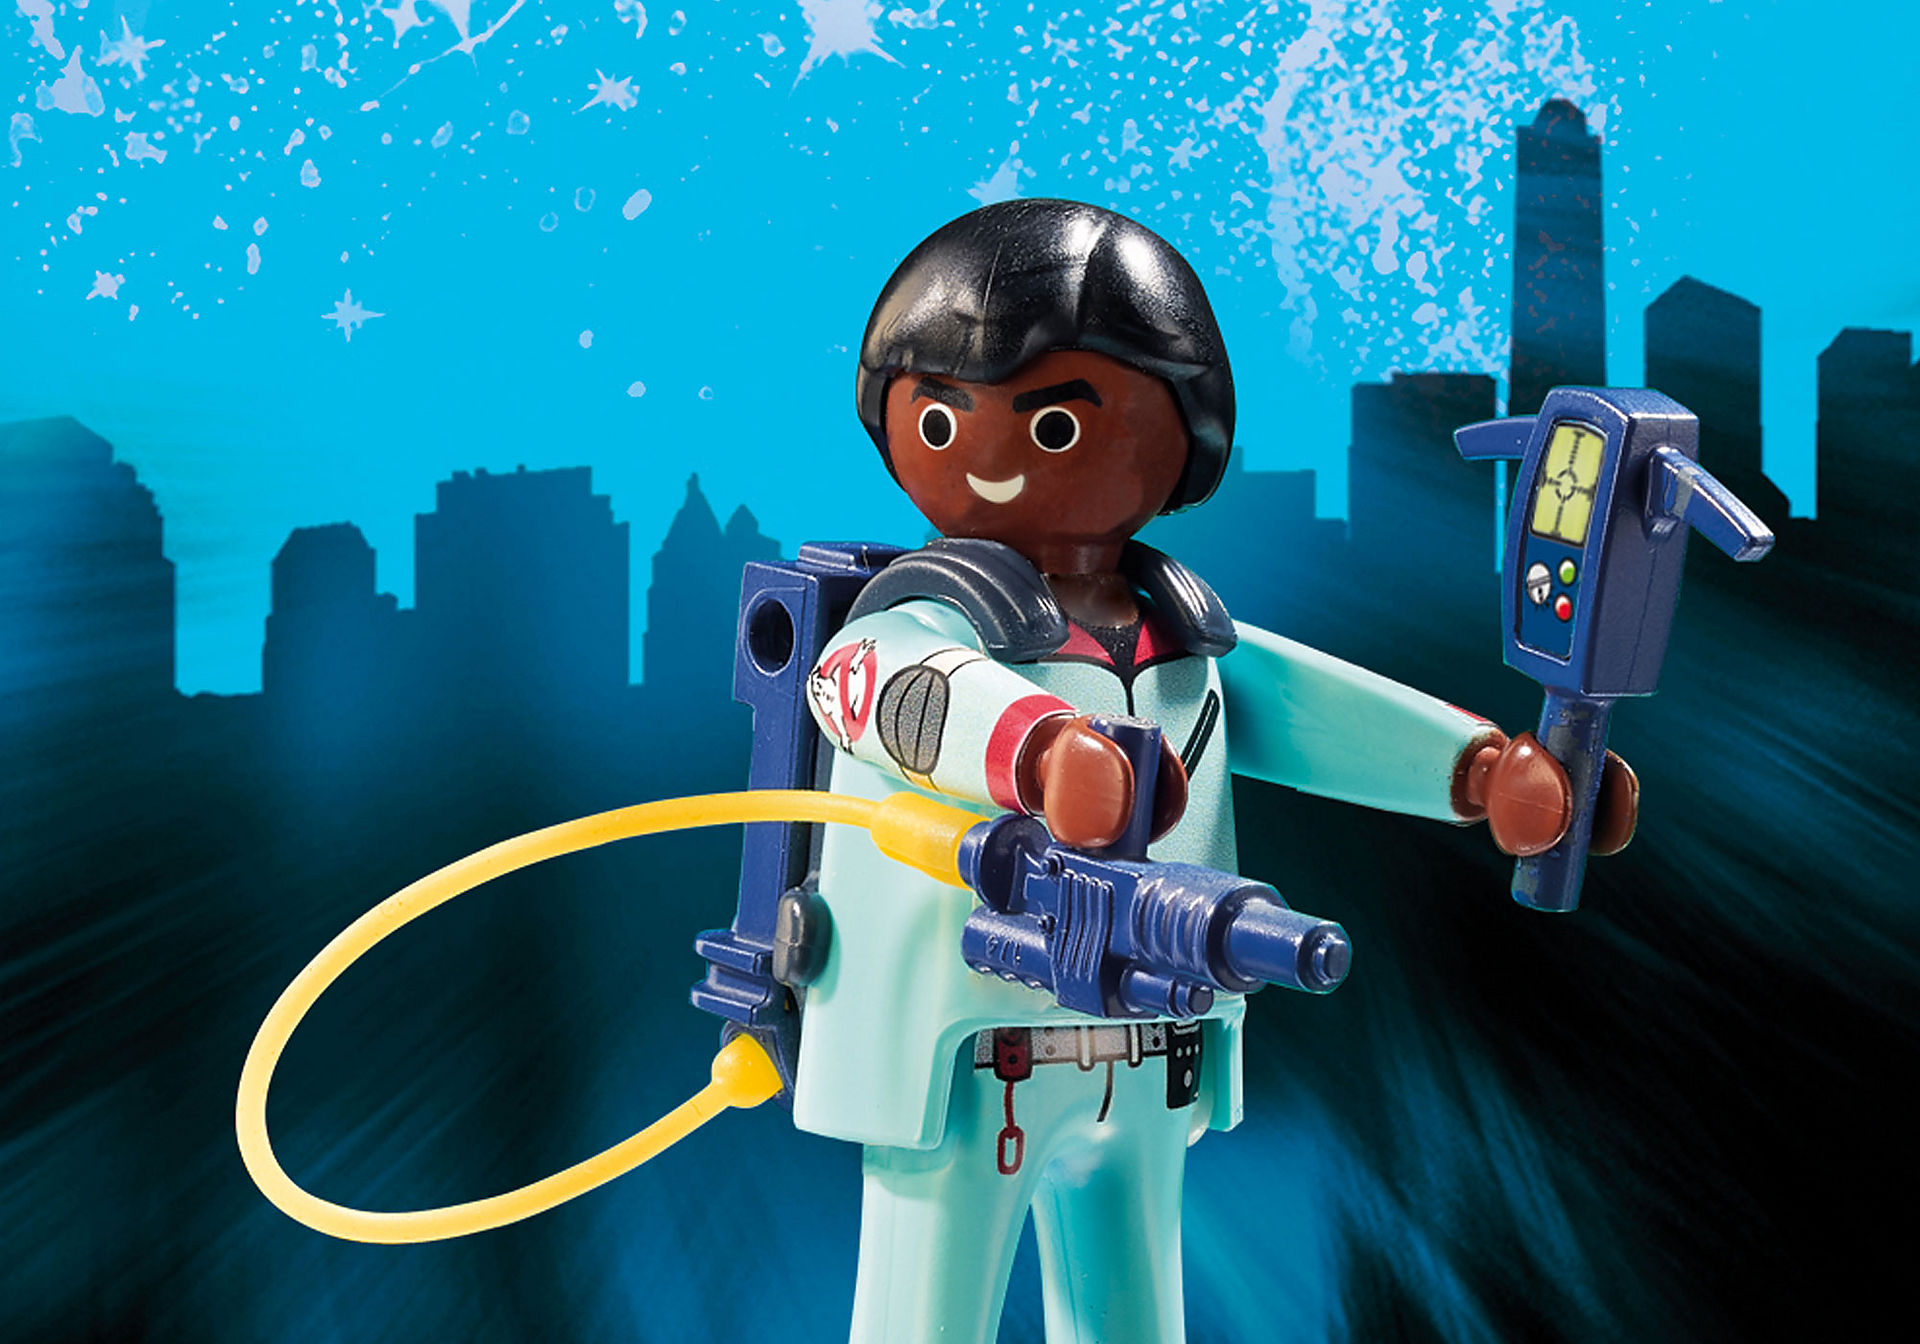 http://media.playmobil.com/i/playmobil/9387_product_extra2/Zeddemore with Aqua Scooter